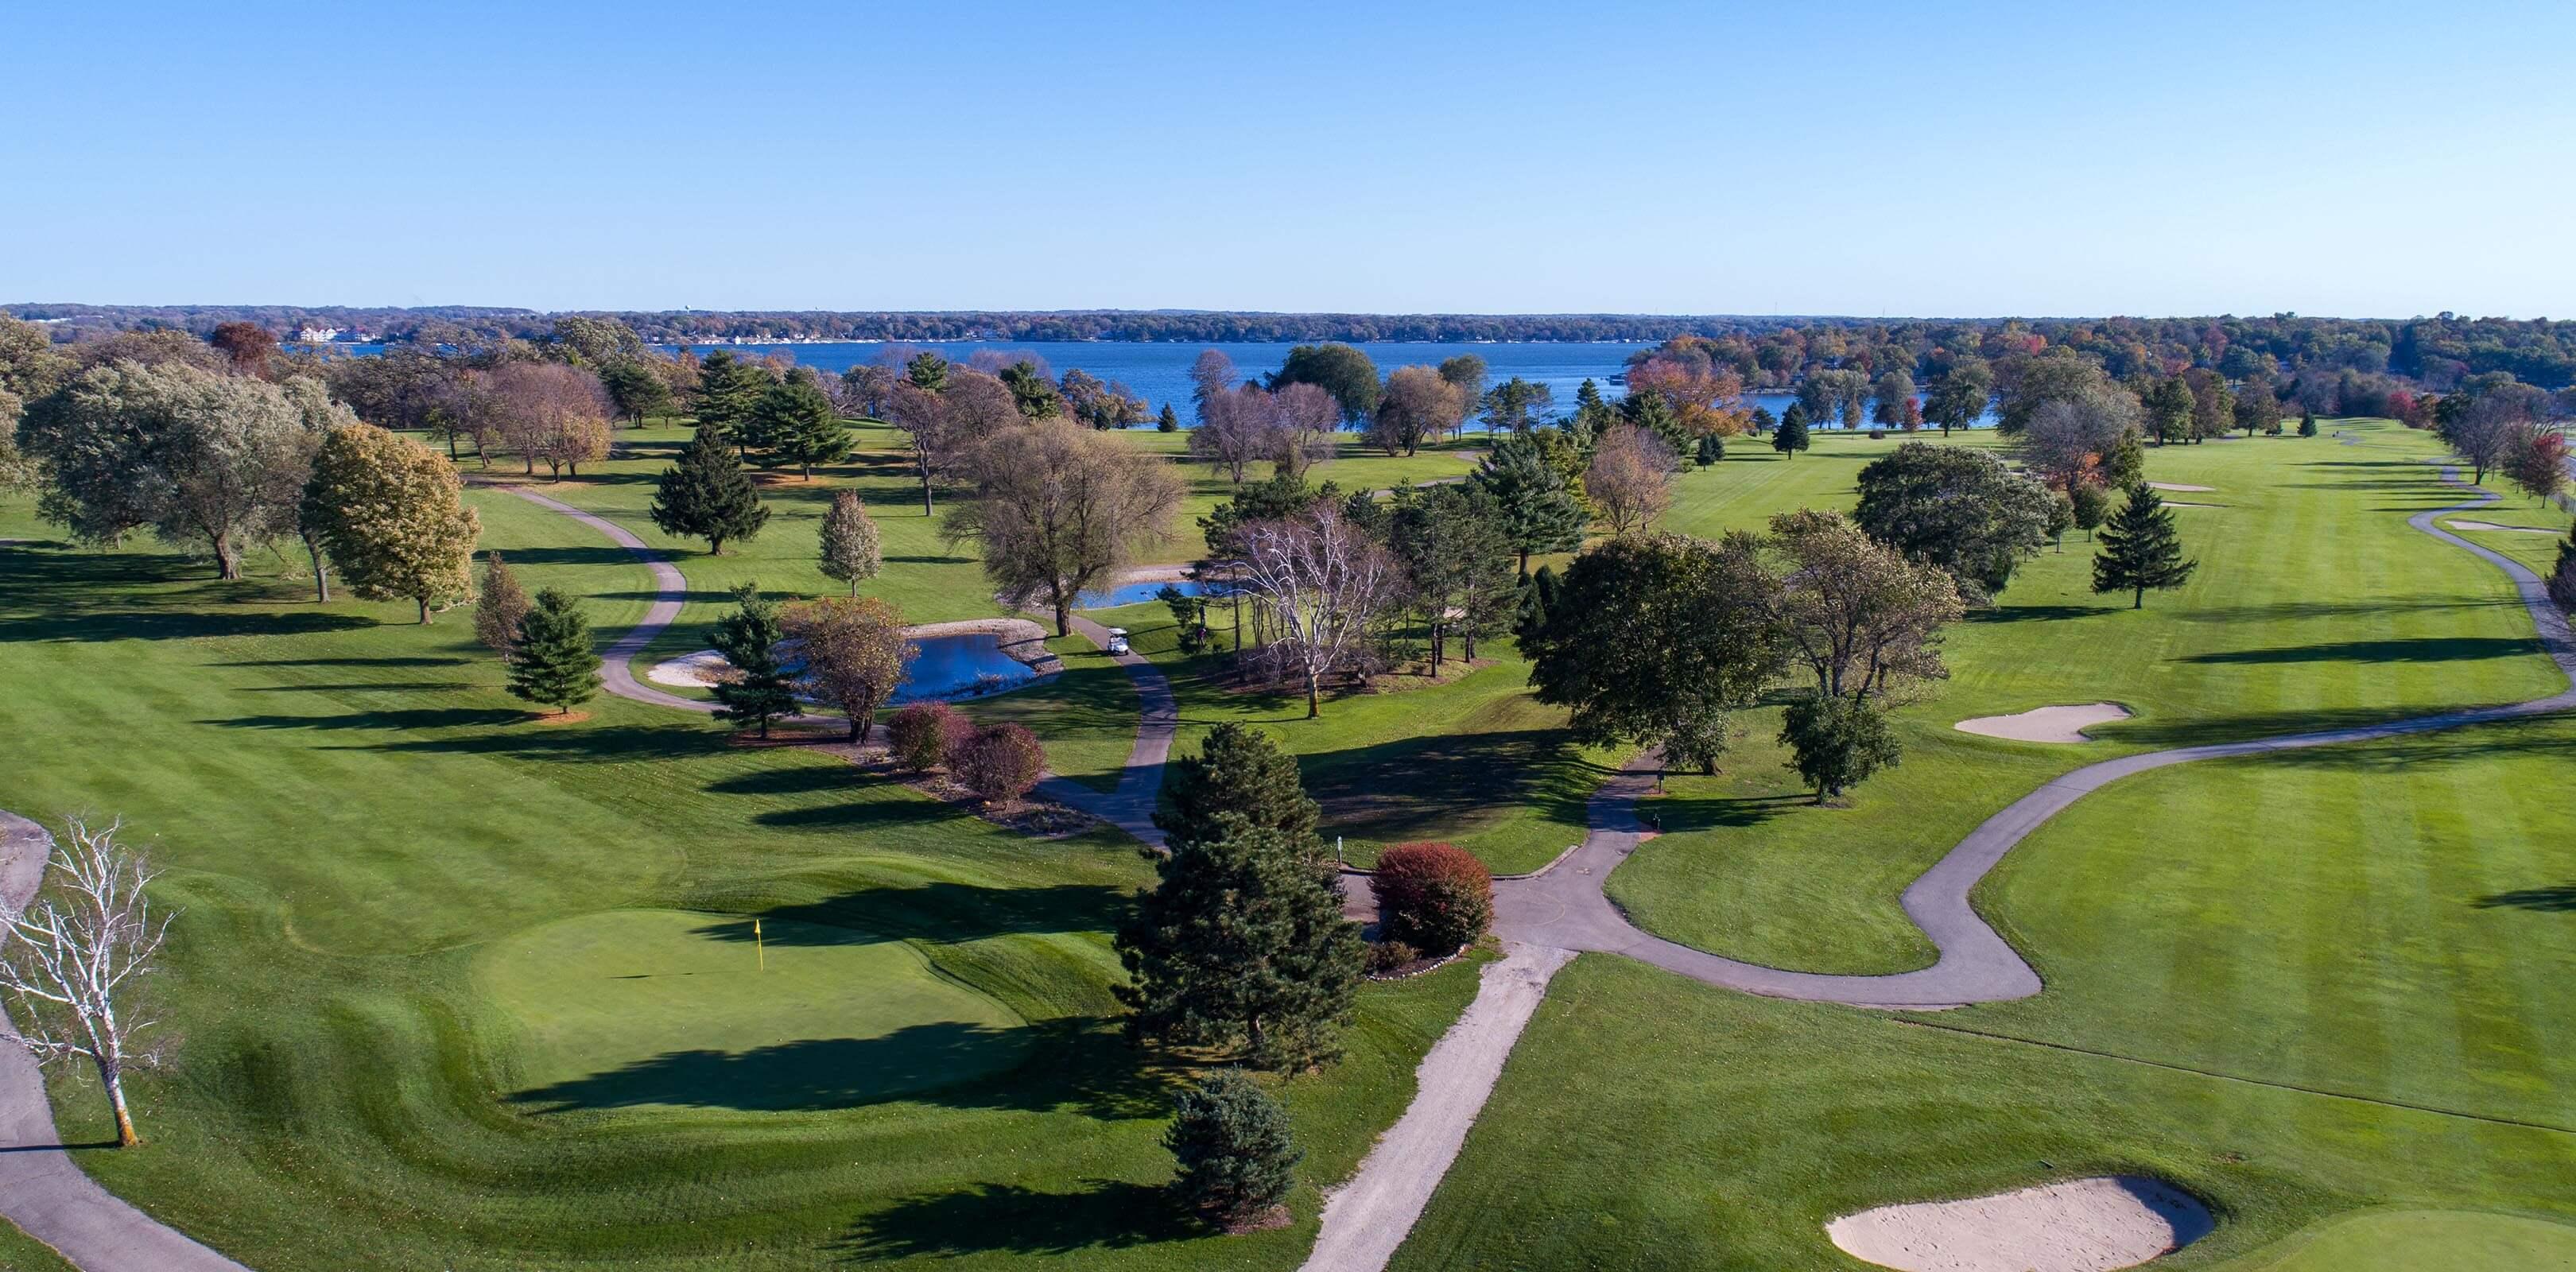 Magestic Oaks Golf